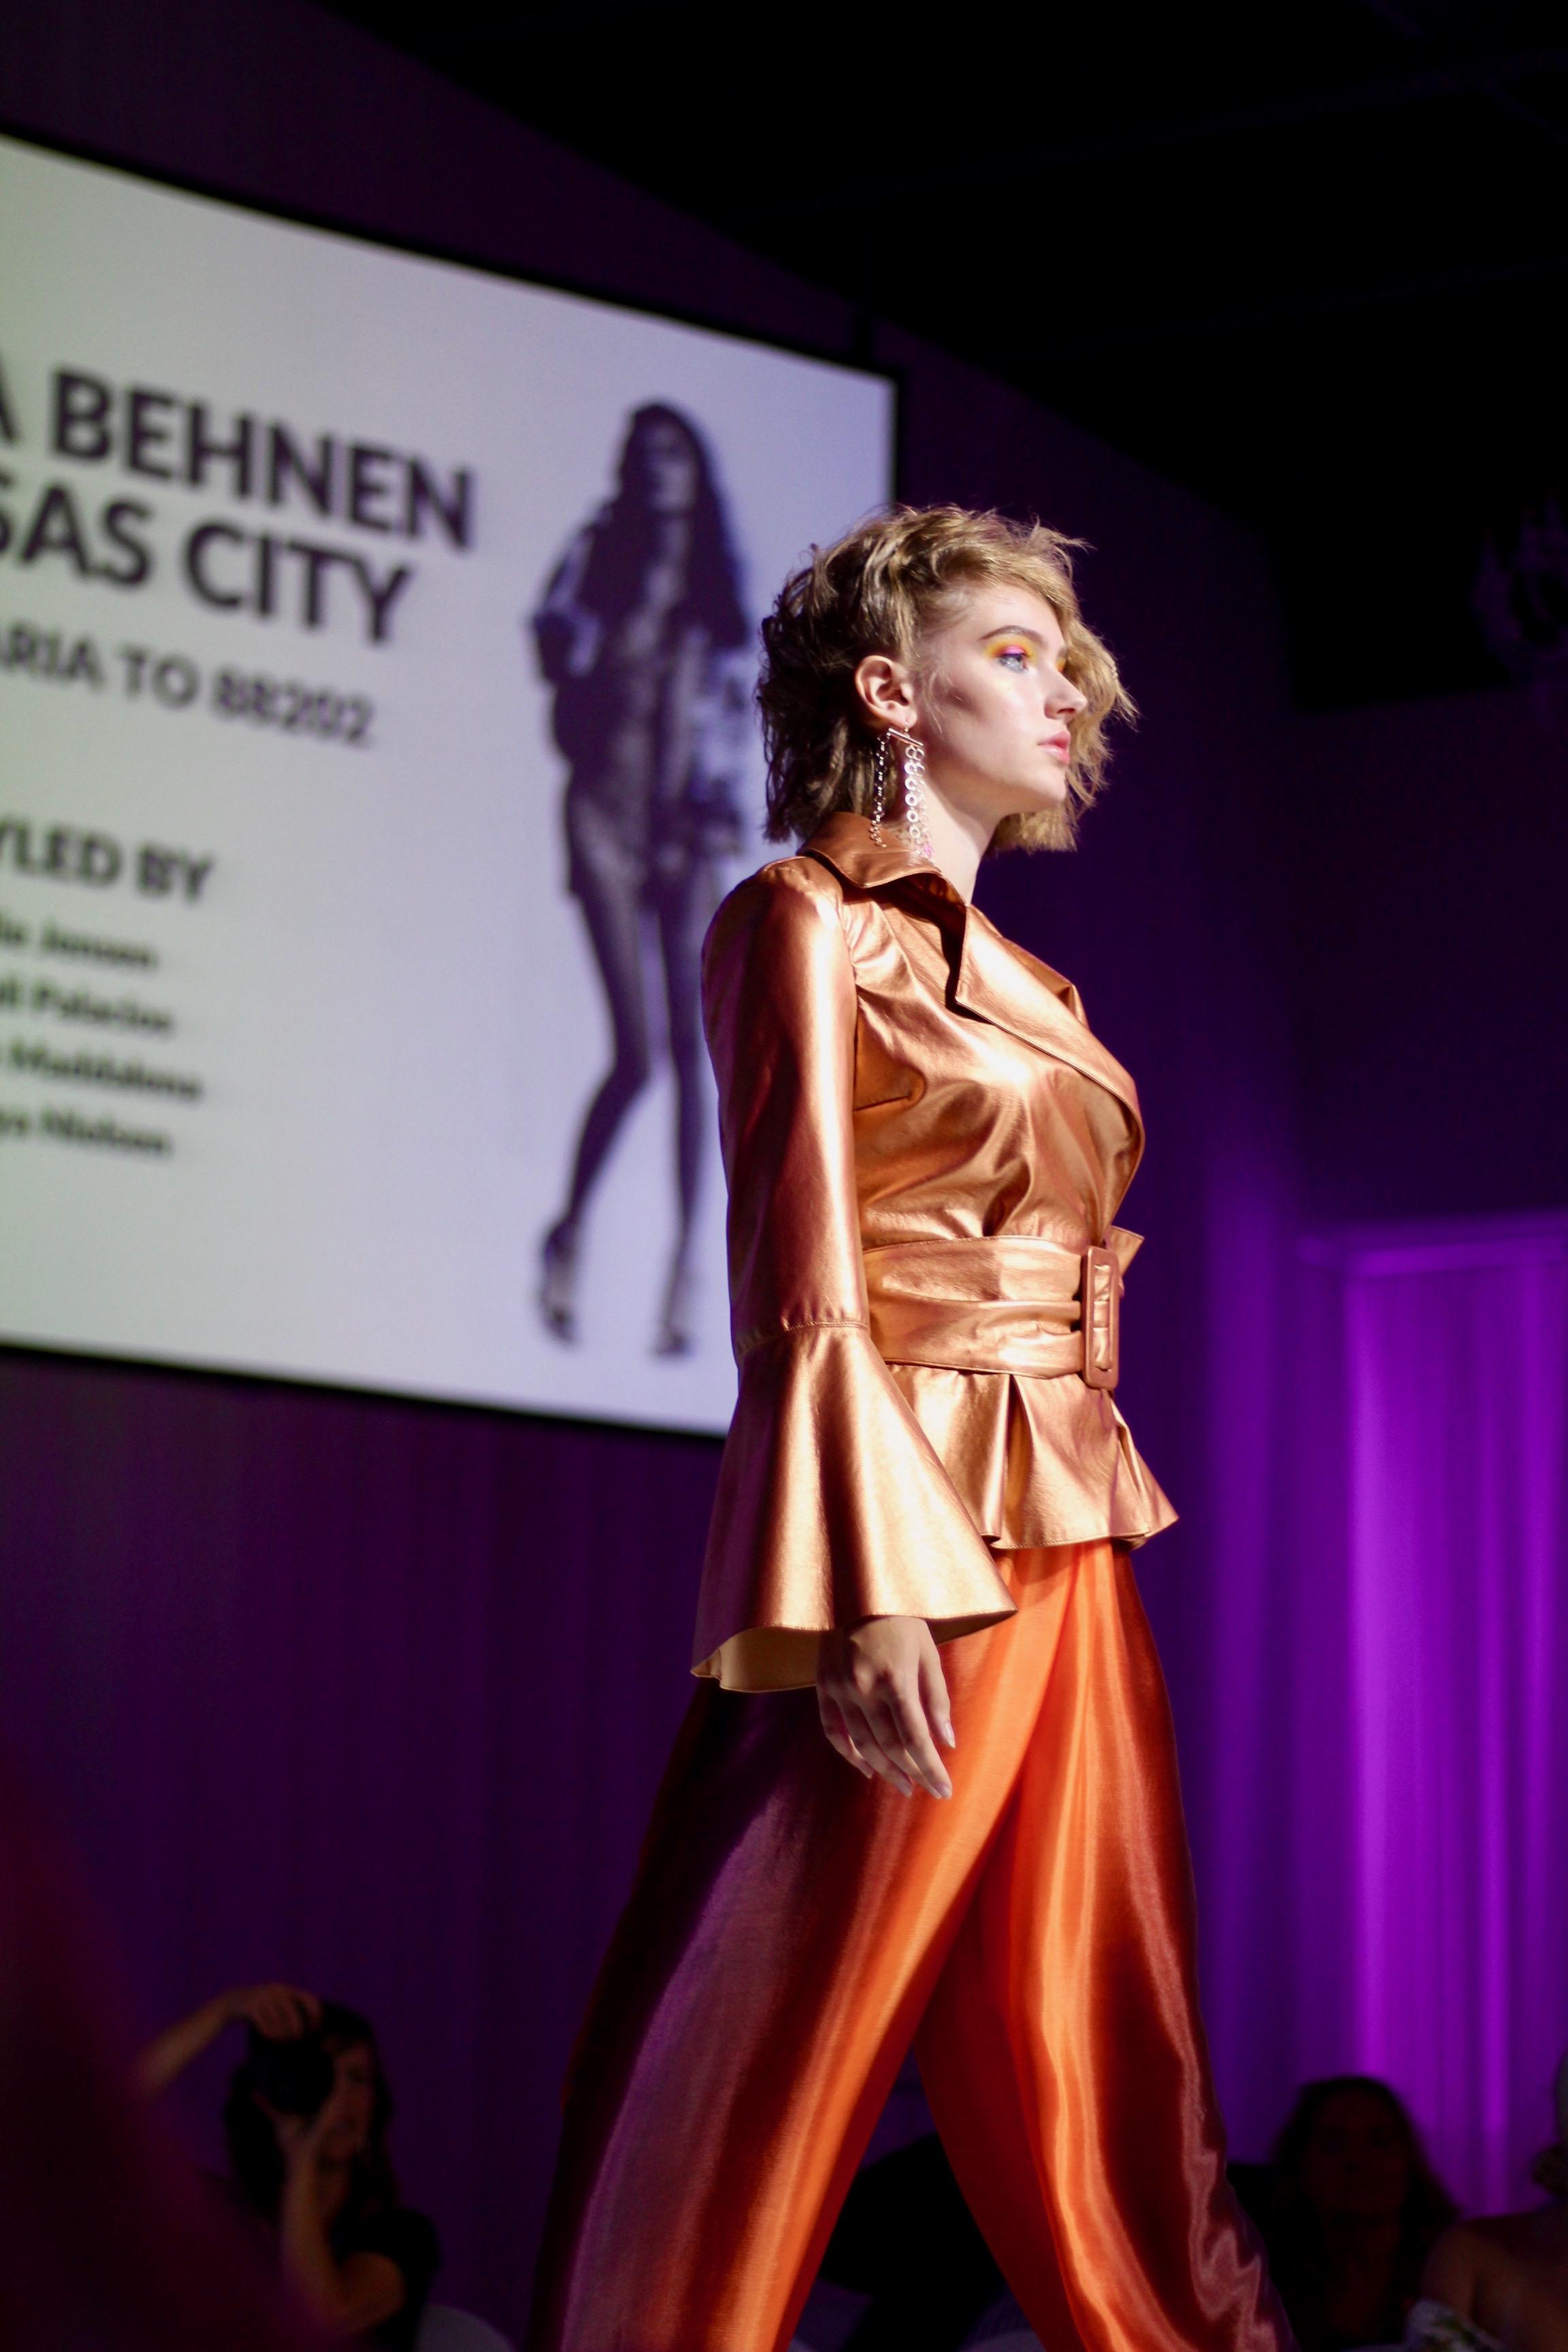 Omaha Fashion Week Fall 2018 | Maria Behnen Kansas City